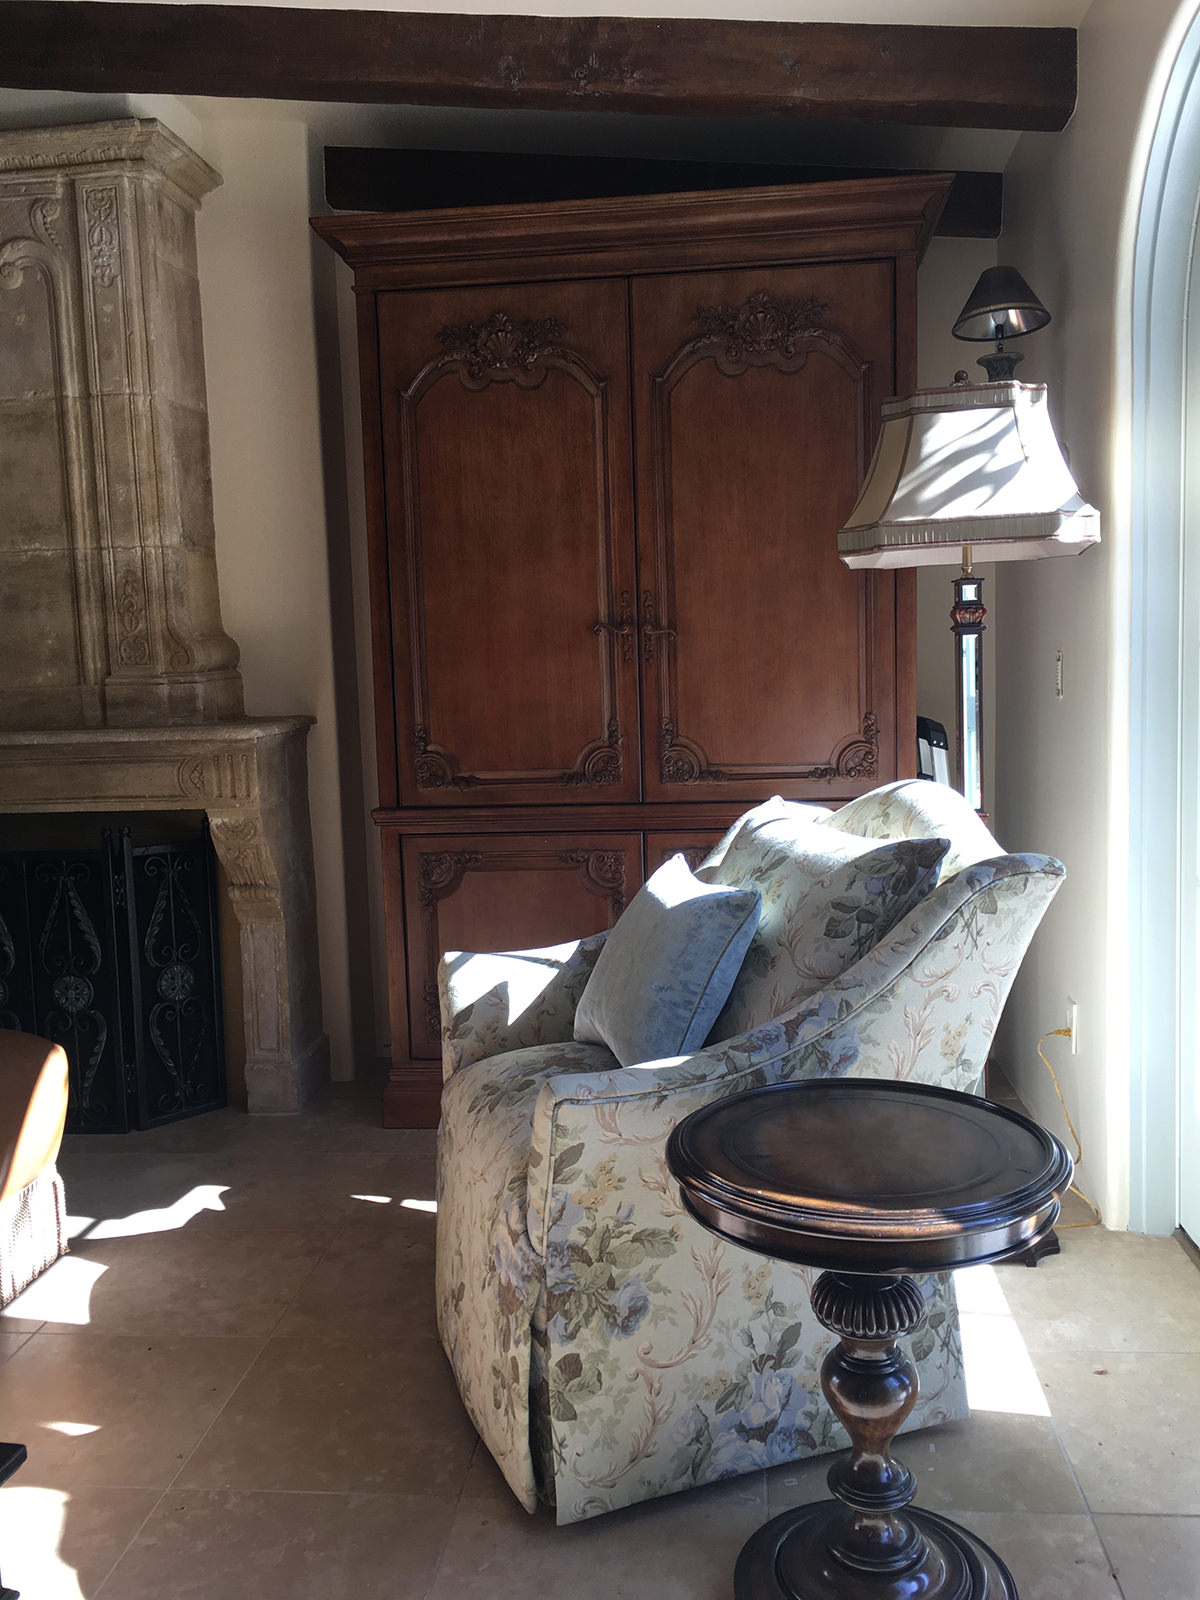 palo-alto-california-french-chateau-family-room-interior-design-montgomery-home-6.jpg